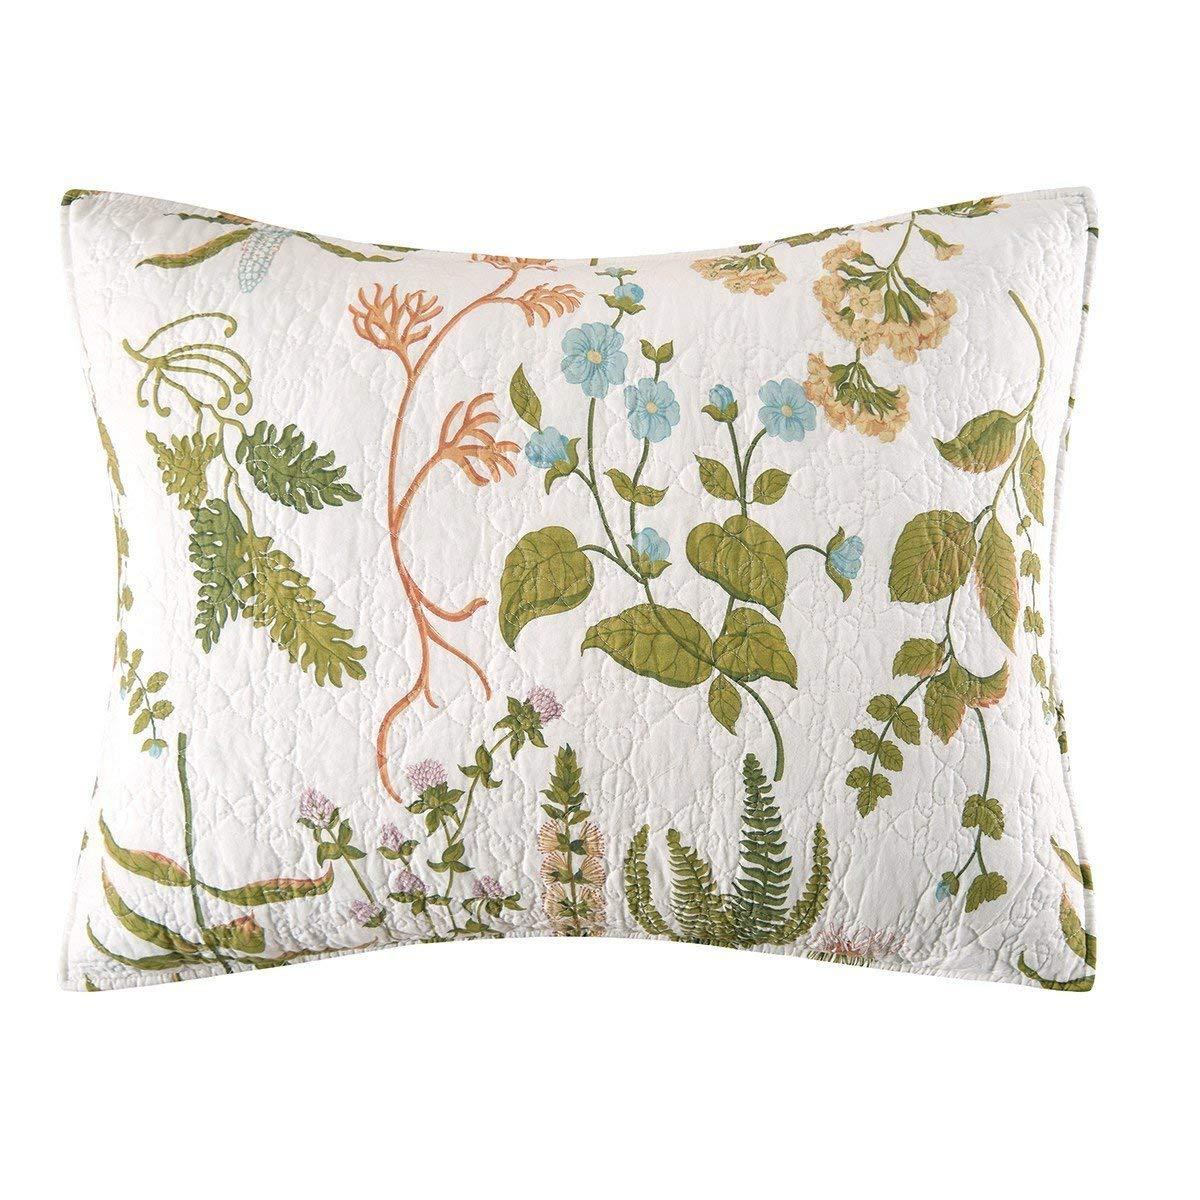 Margherita Missoni Allover Floral Standard Sham: Buy Magnolia Garden Floral Ruffle Pillow Sham Blue Sham In